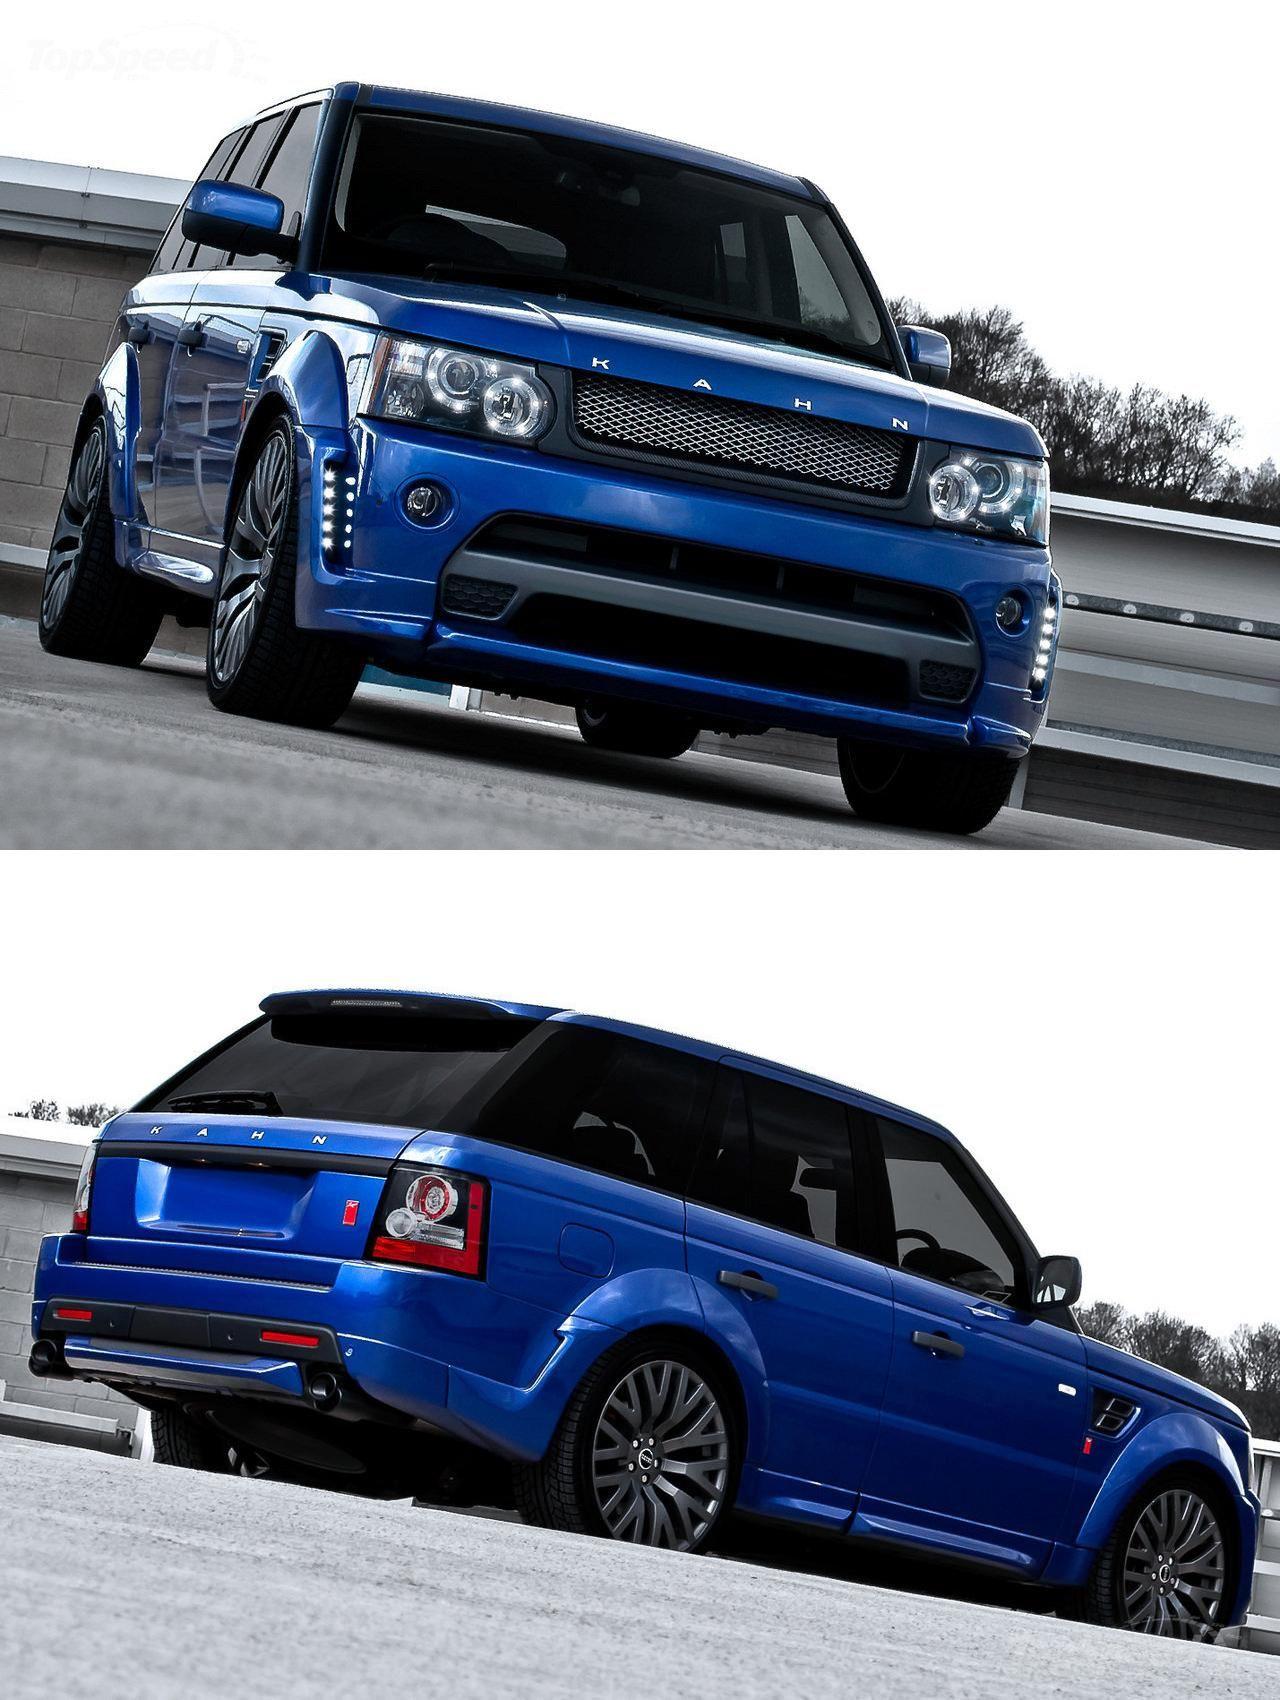 2012 Range Rover Rs300 Cosworth Bali Blue Kahn Design Range Rover Sport Land Rover Sport Range Rover Supercharged